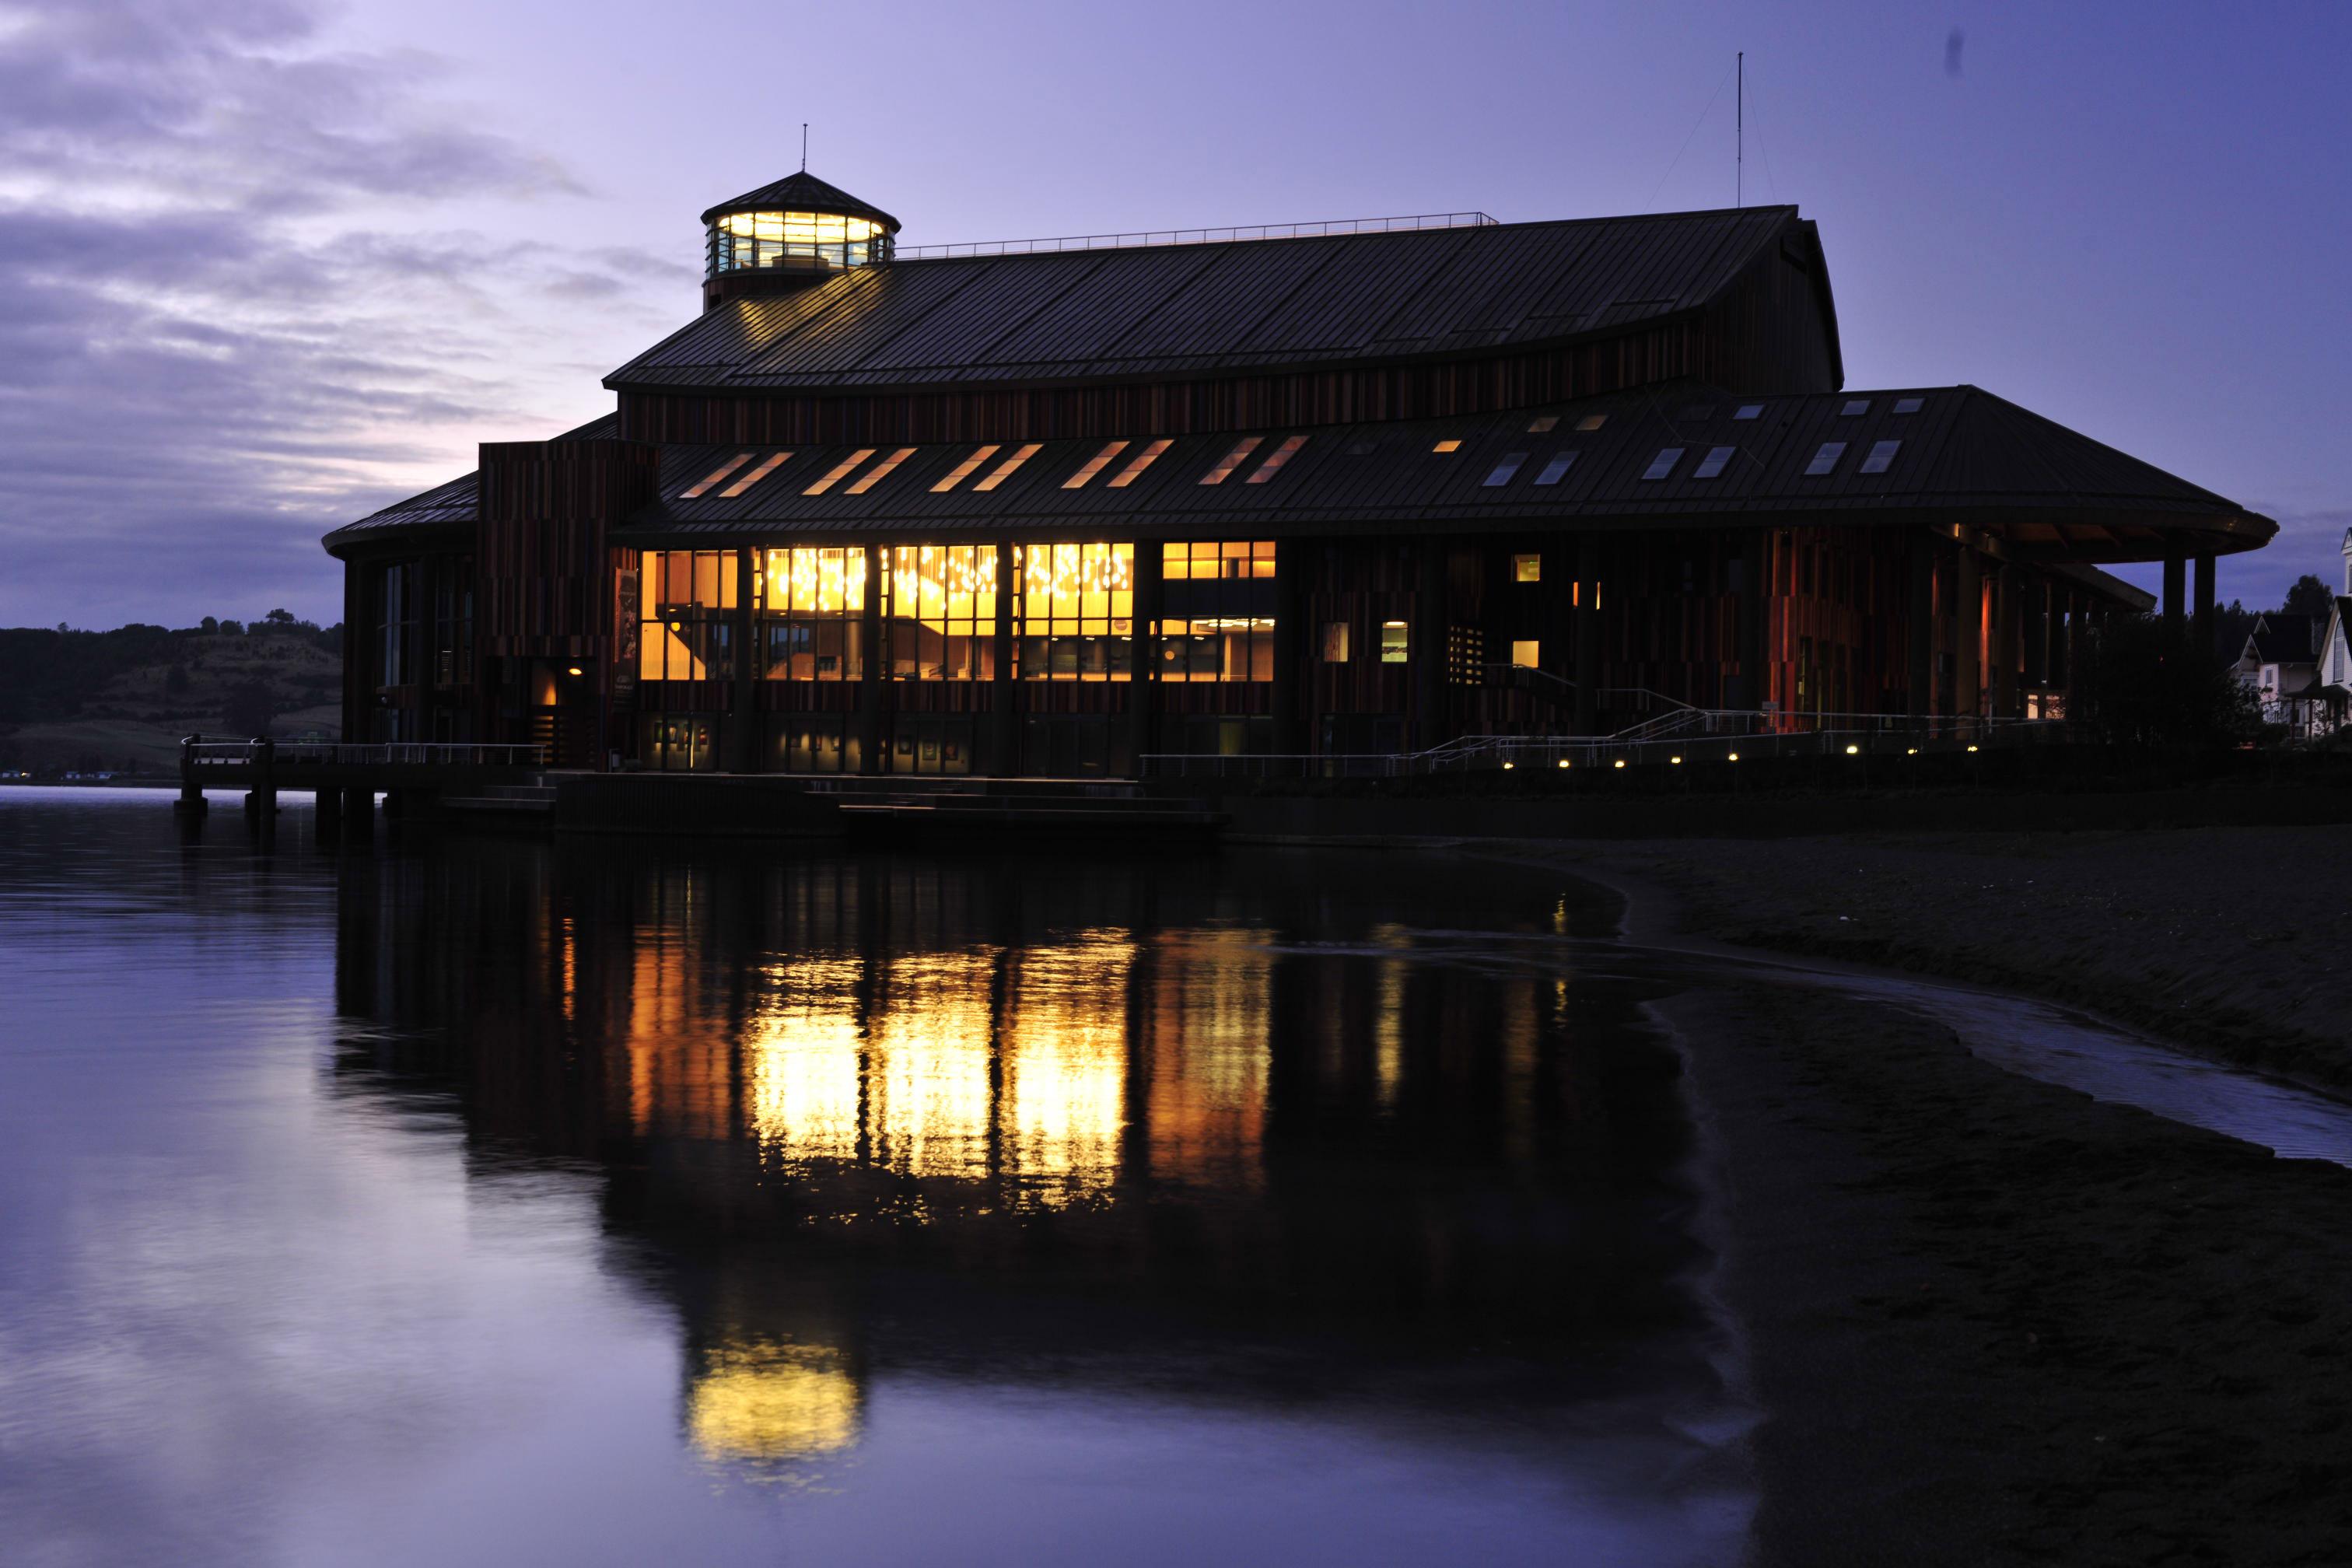 Projeto de Iluminação: Teatro del Lago / LLD – Limarí Lighting Design, © Guy Wenborne